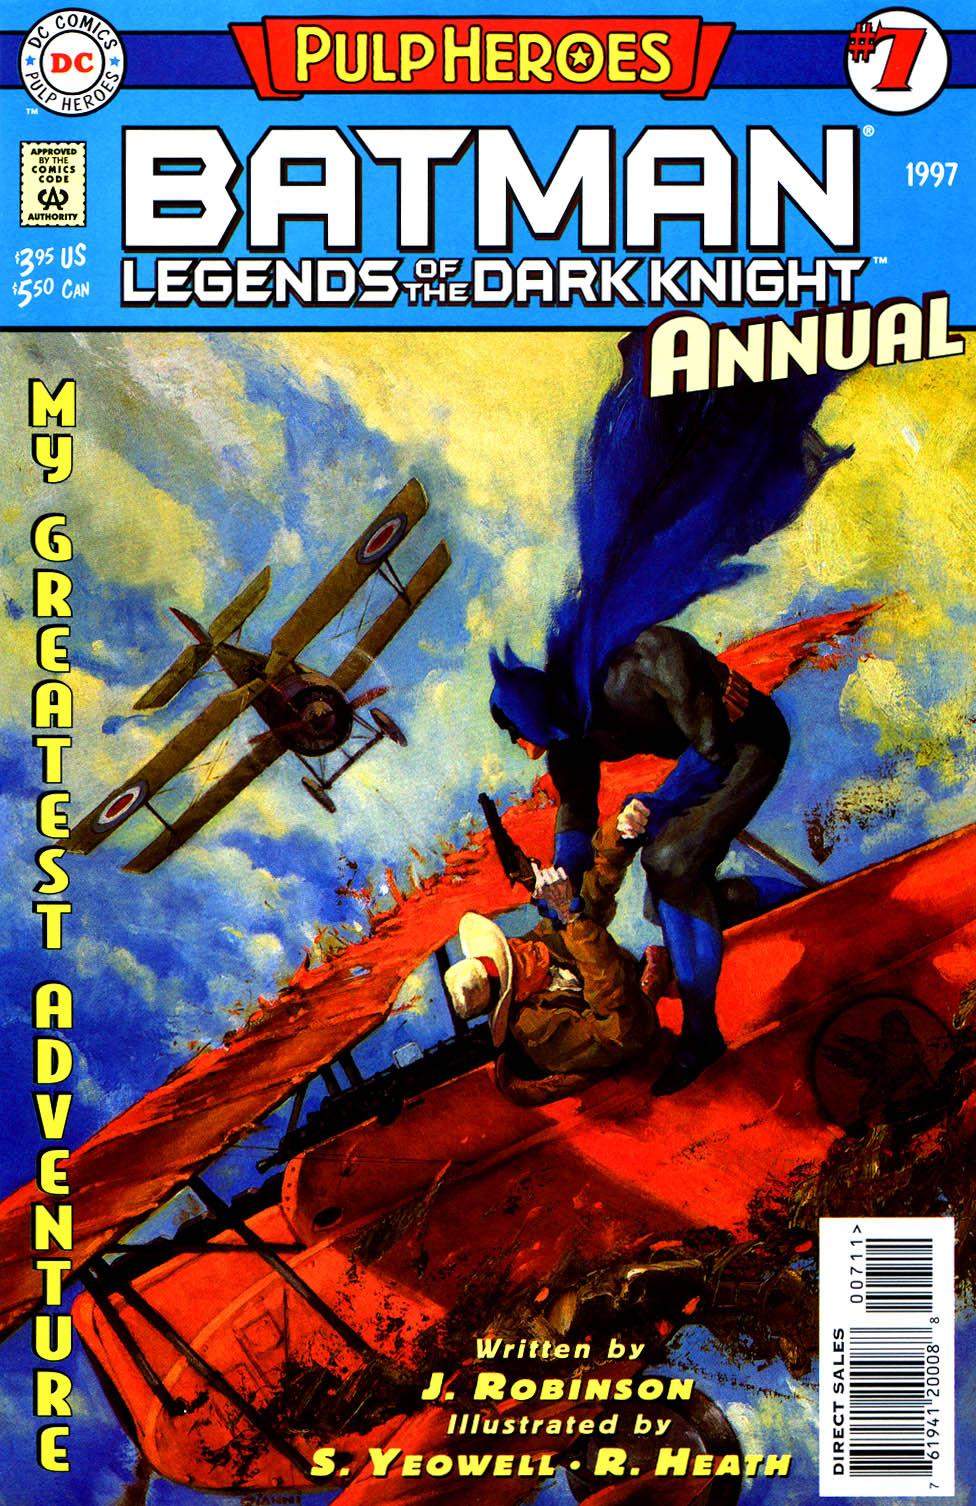 Batman: Legends of the Dark Knight Annual Vol 1 7